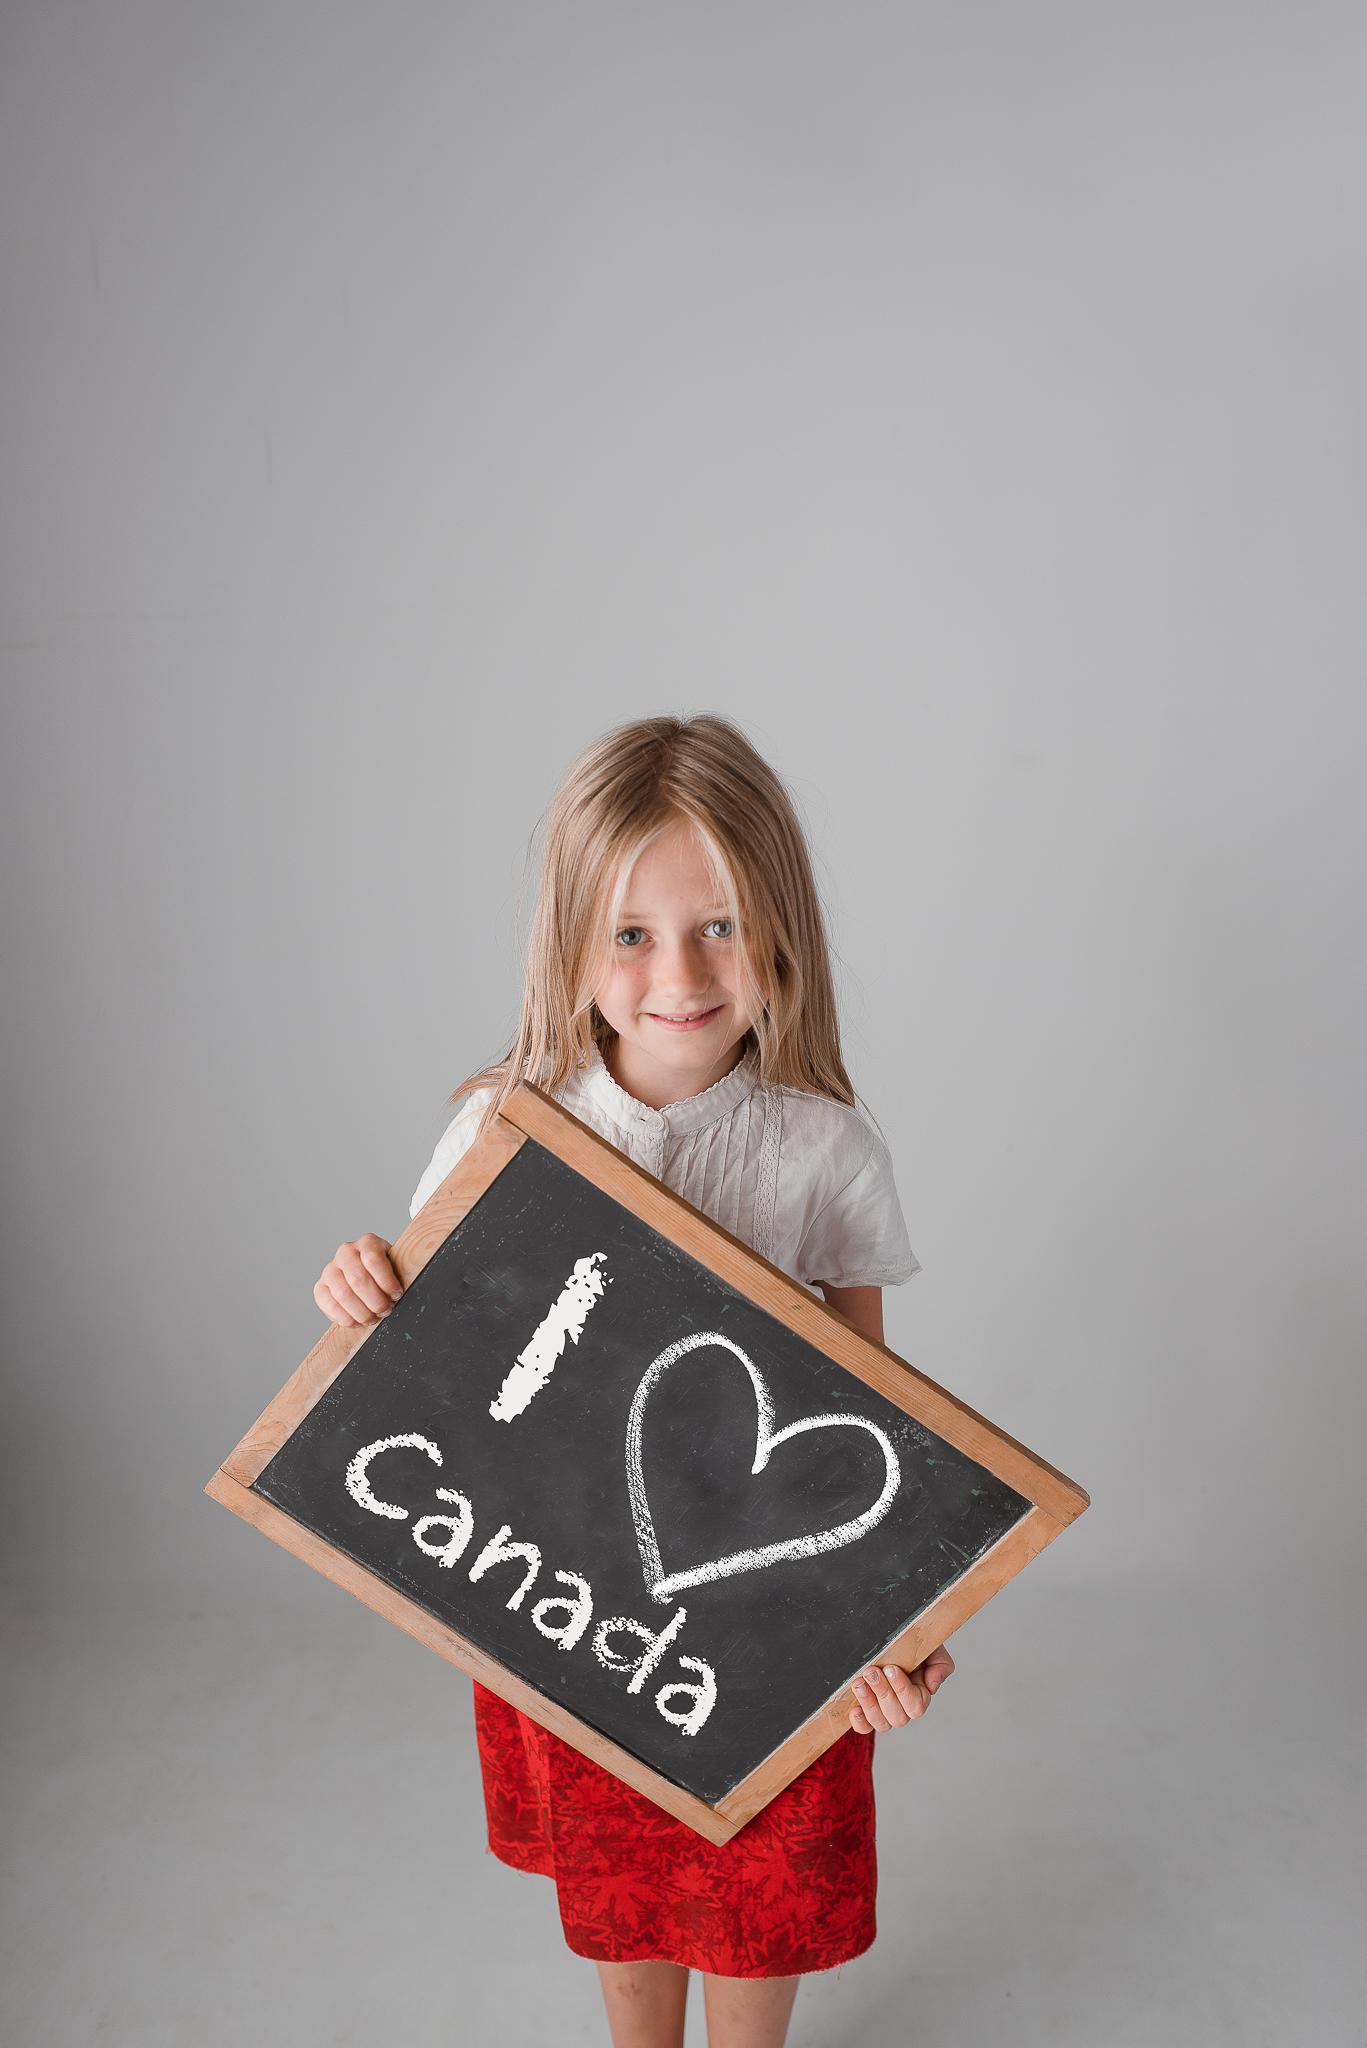 Naomi Lucienne Peterborough Photography Portrait Photography Children Photography Family Photography-6.jpg